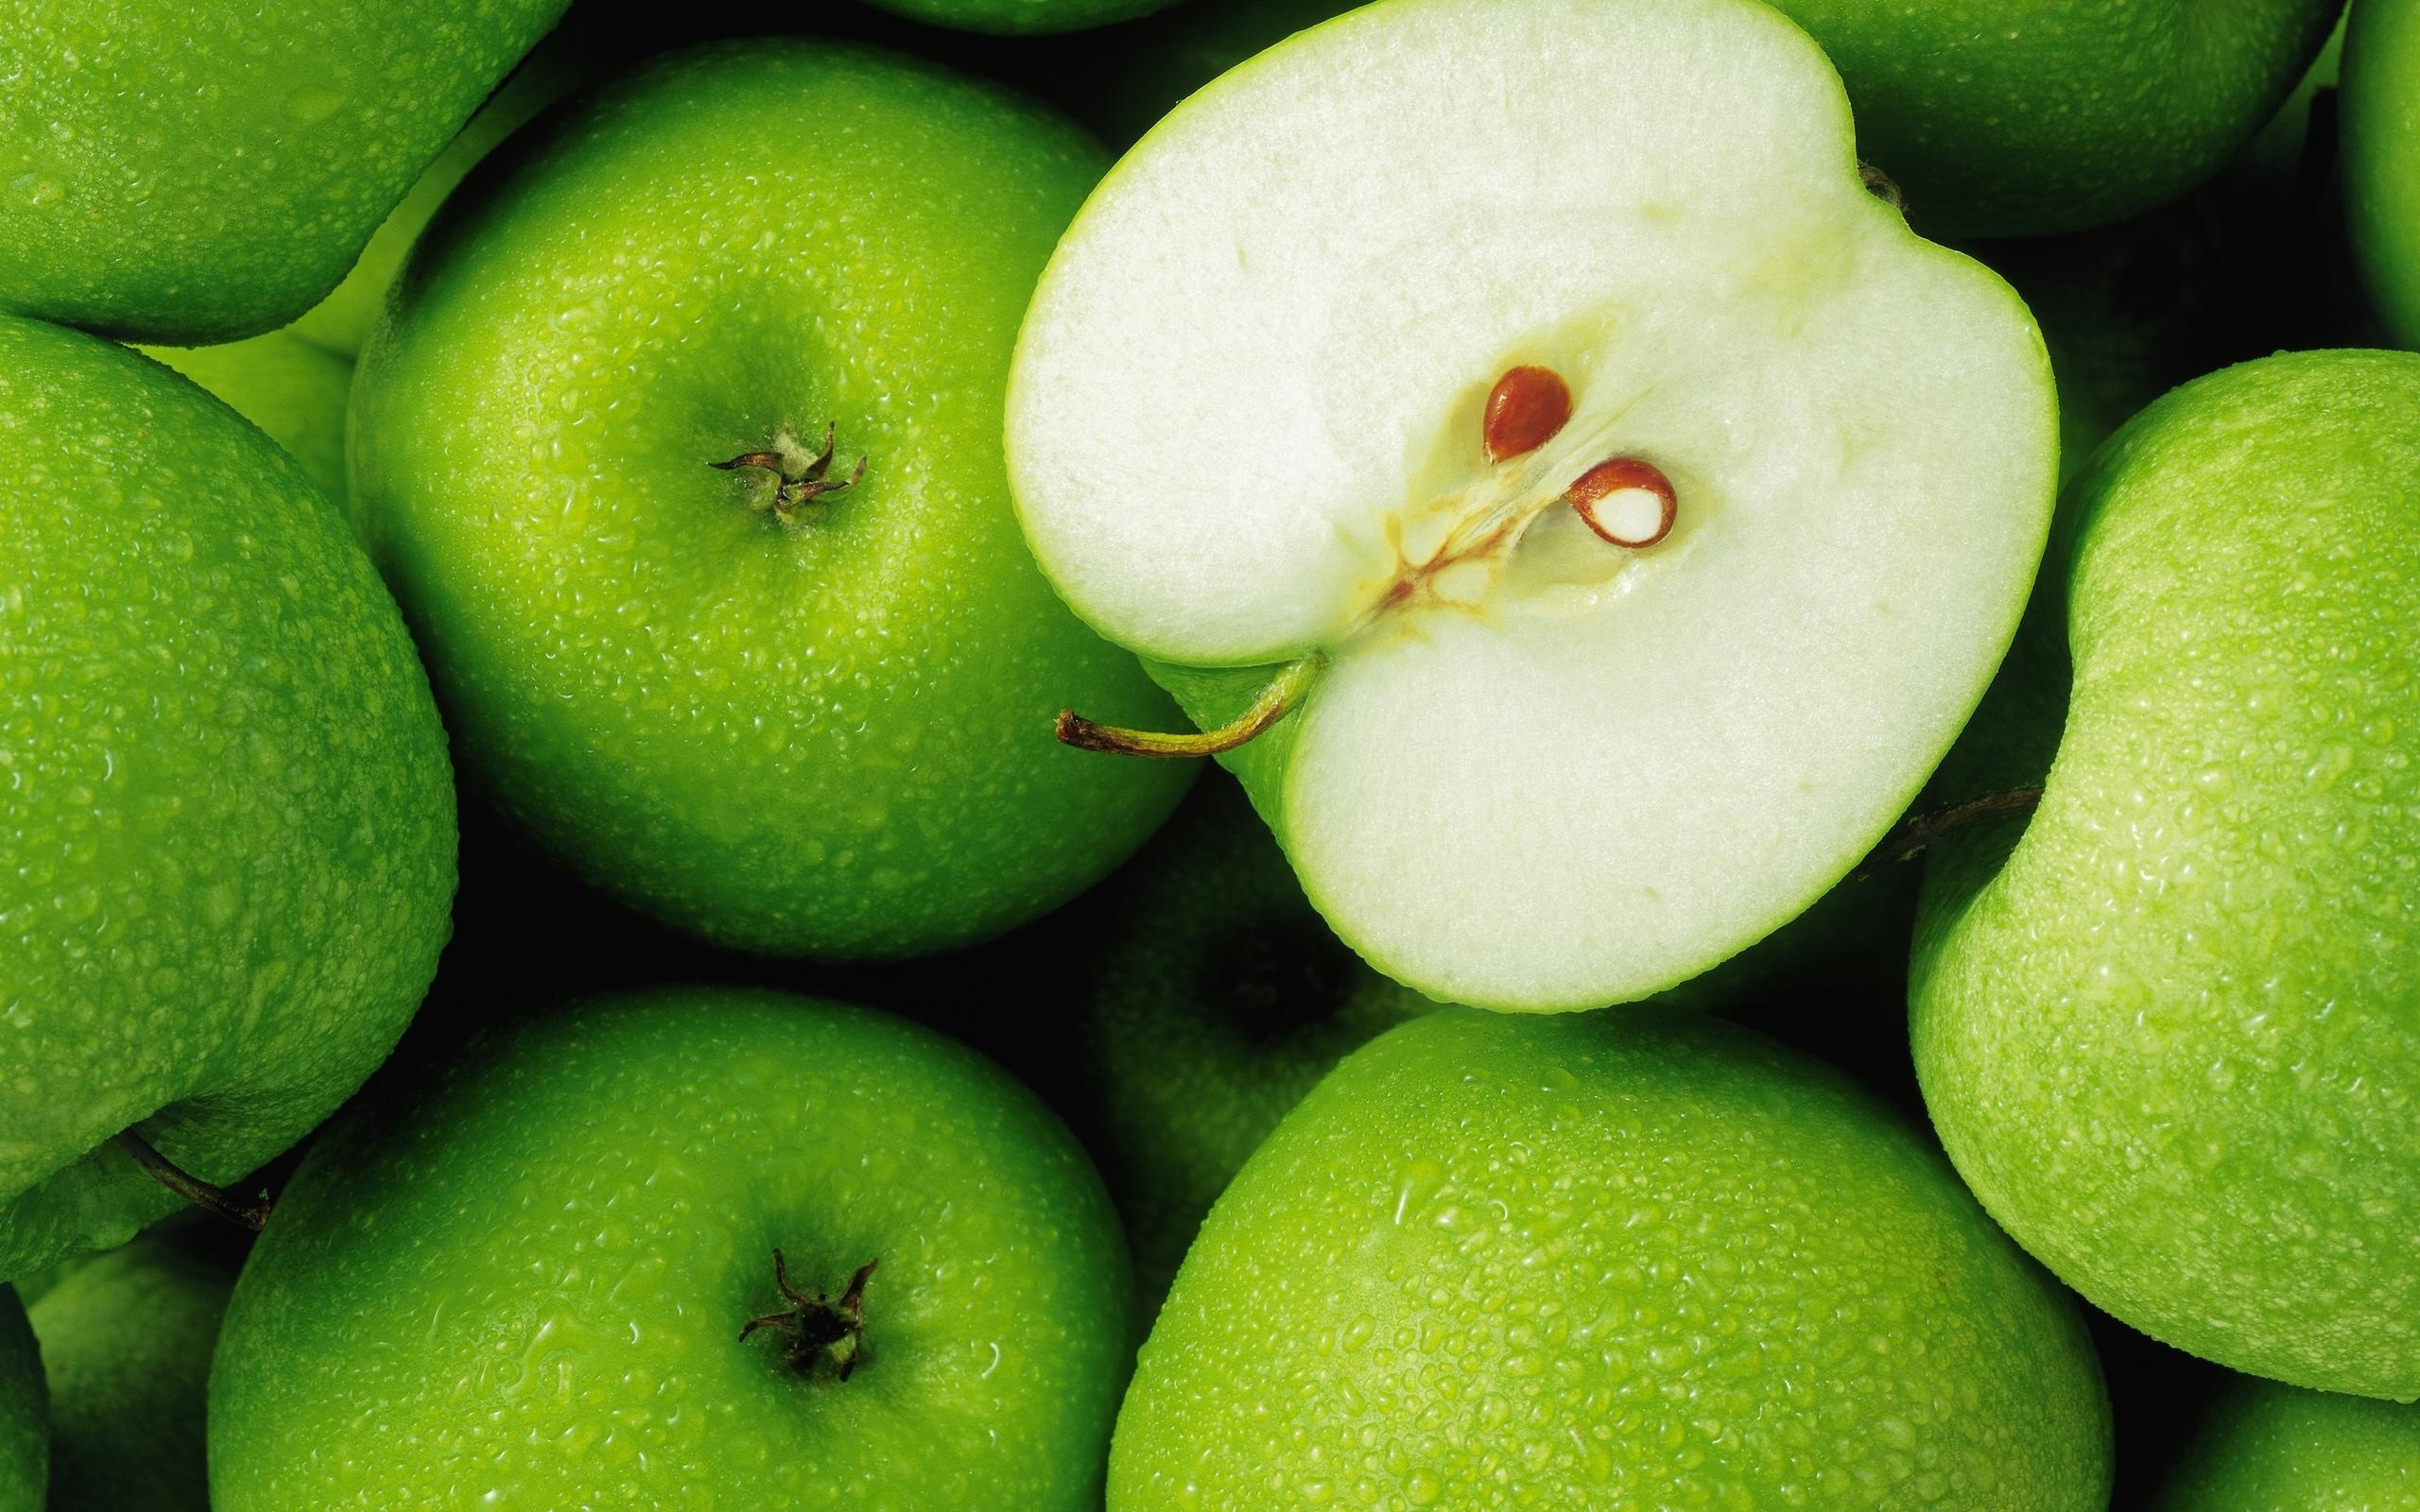 РЕЦЕПТЫ: 19 зелёных смузи